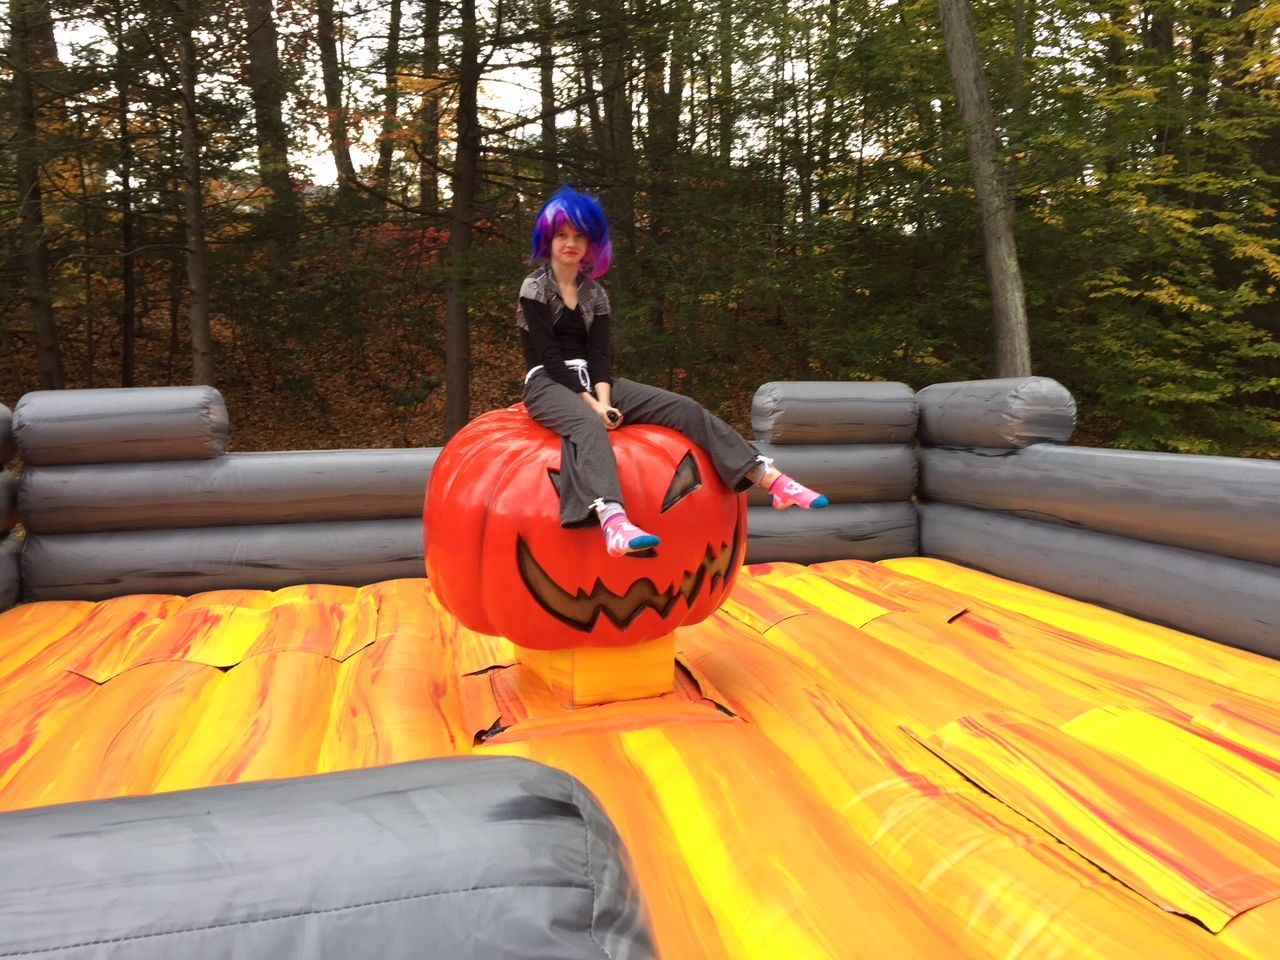 Mechanical Pumpkin Birthday party rentals, to